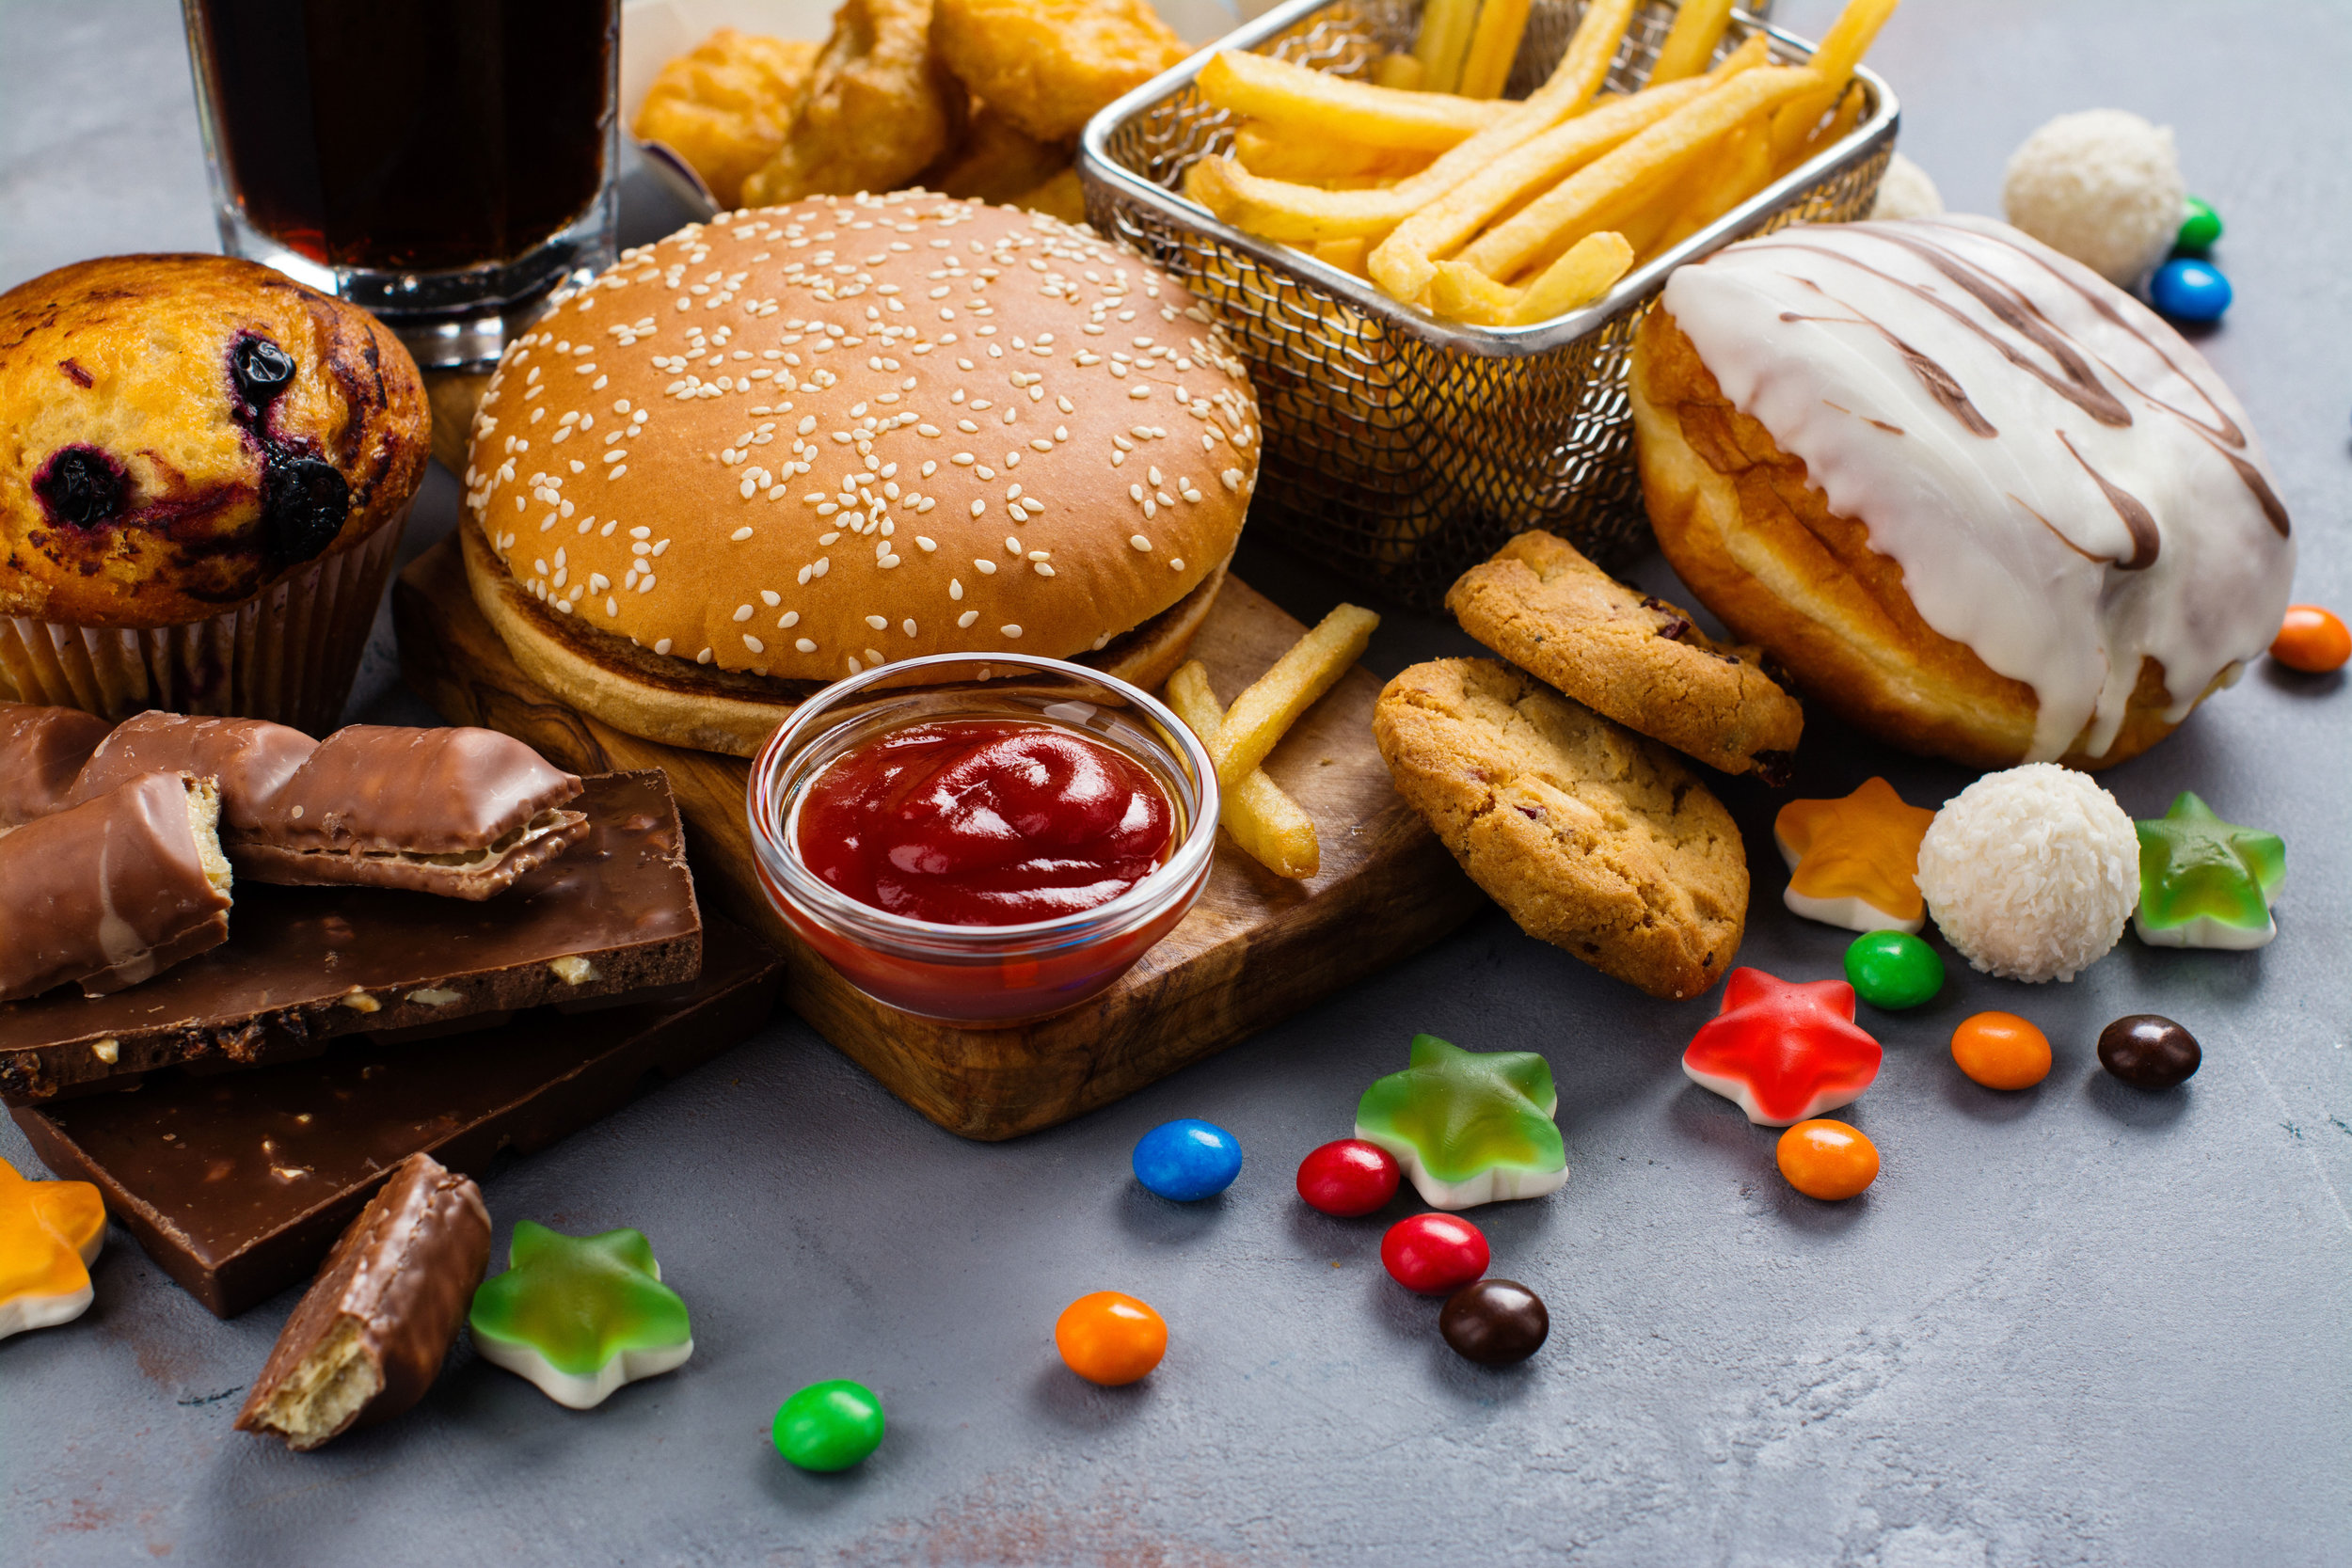 unhealthy junk food burger candy donut muffin desert